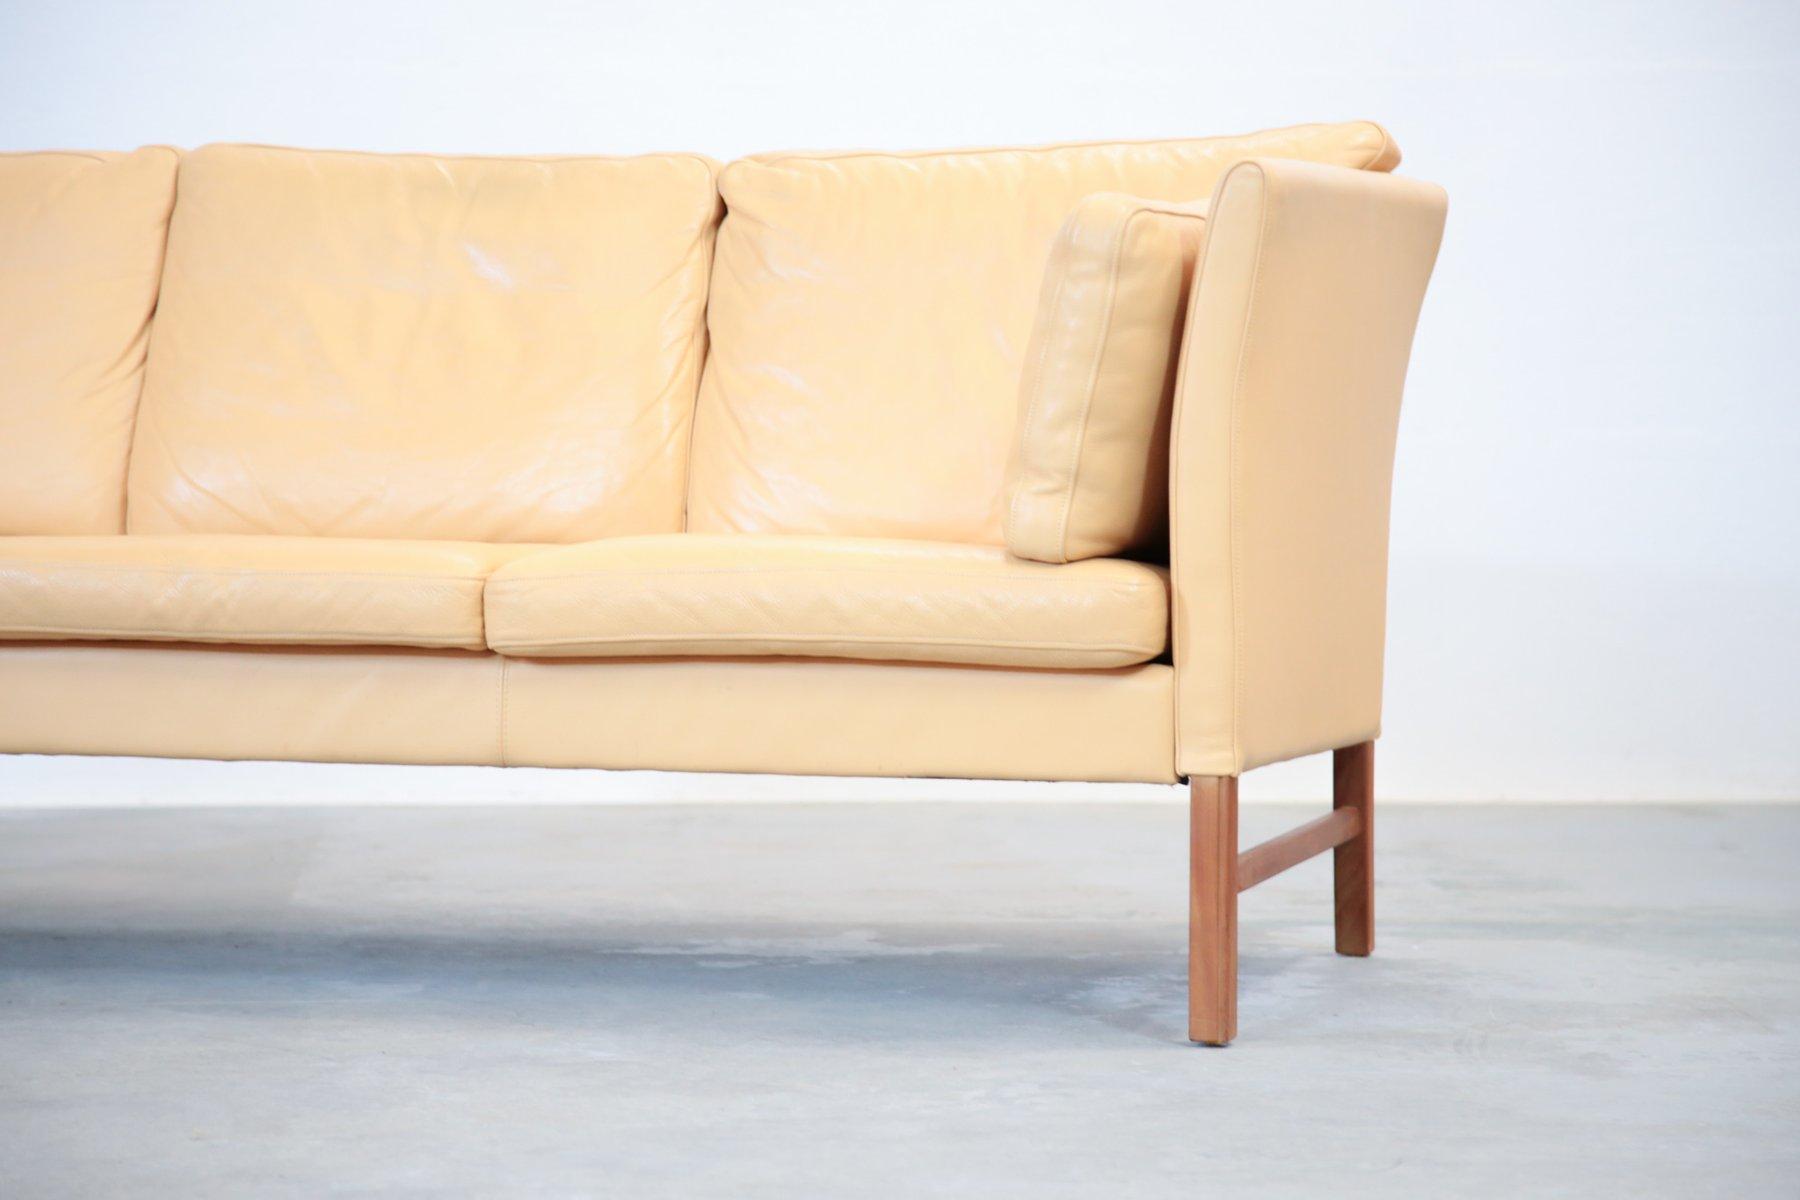 d nisches 3 sitzer ledersofa in beige 1970er bei pamono kaufen. Black Bedroom Furniture Sets. Home Design Ideas